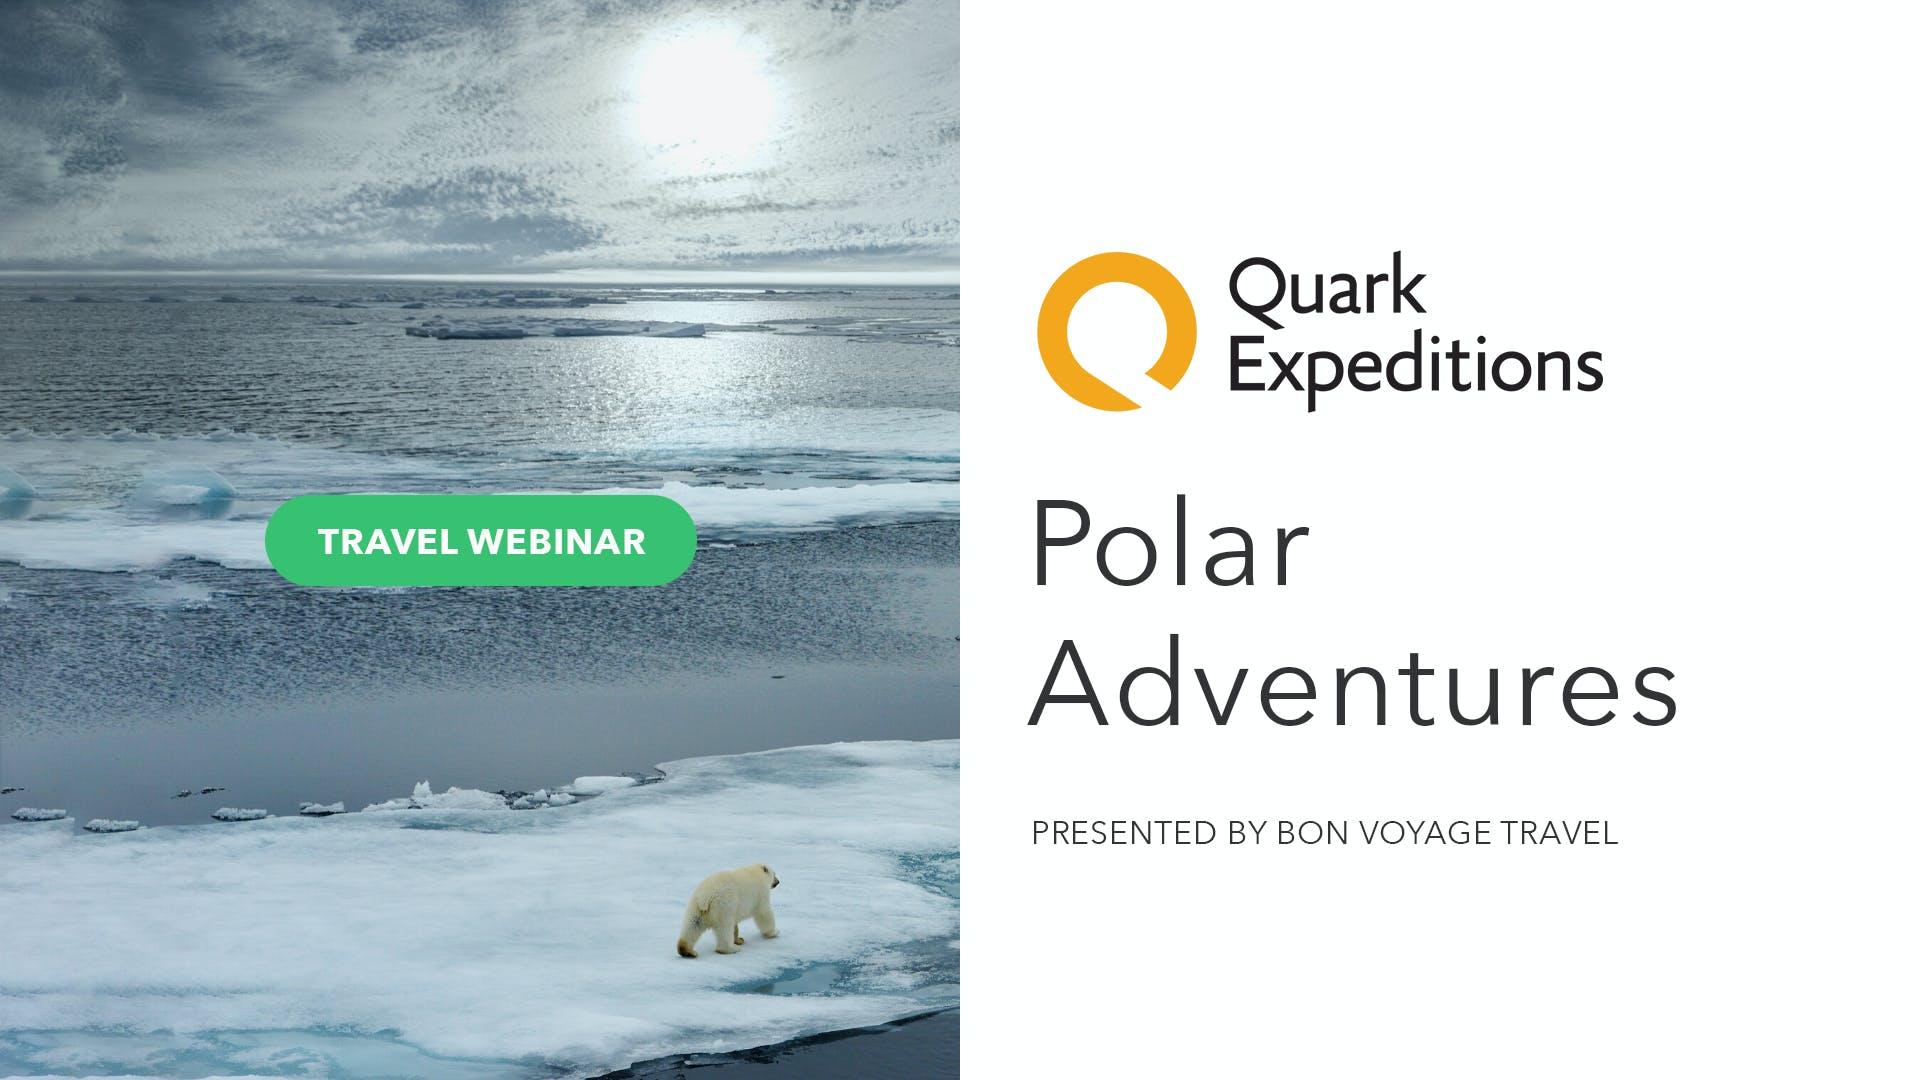 Polar Adventures with Quark Expeditions